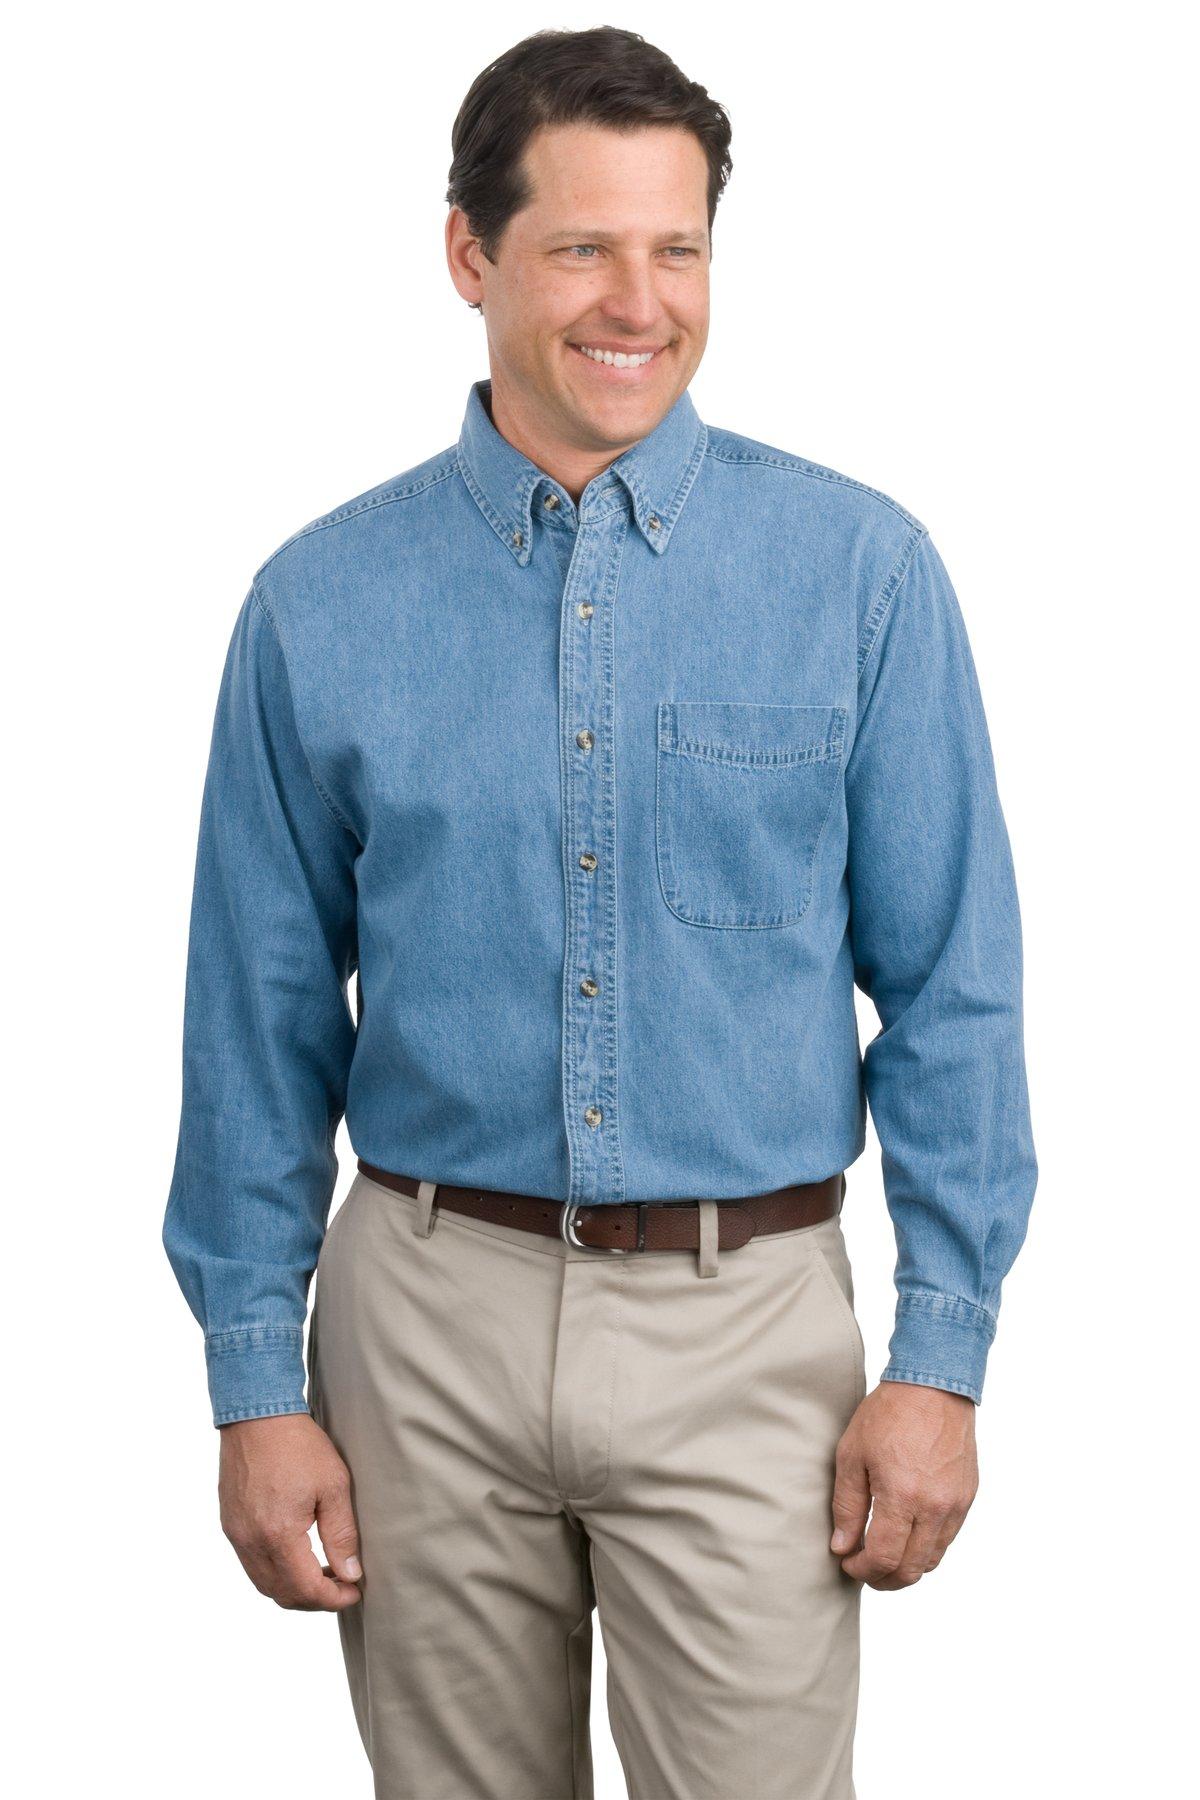 Woven-Shirts-Cotton-24